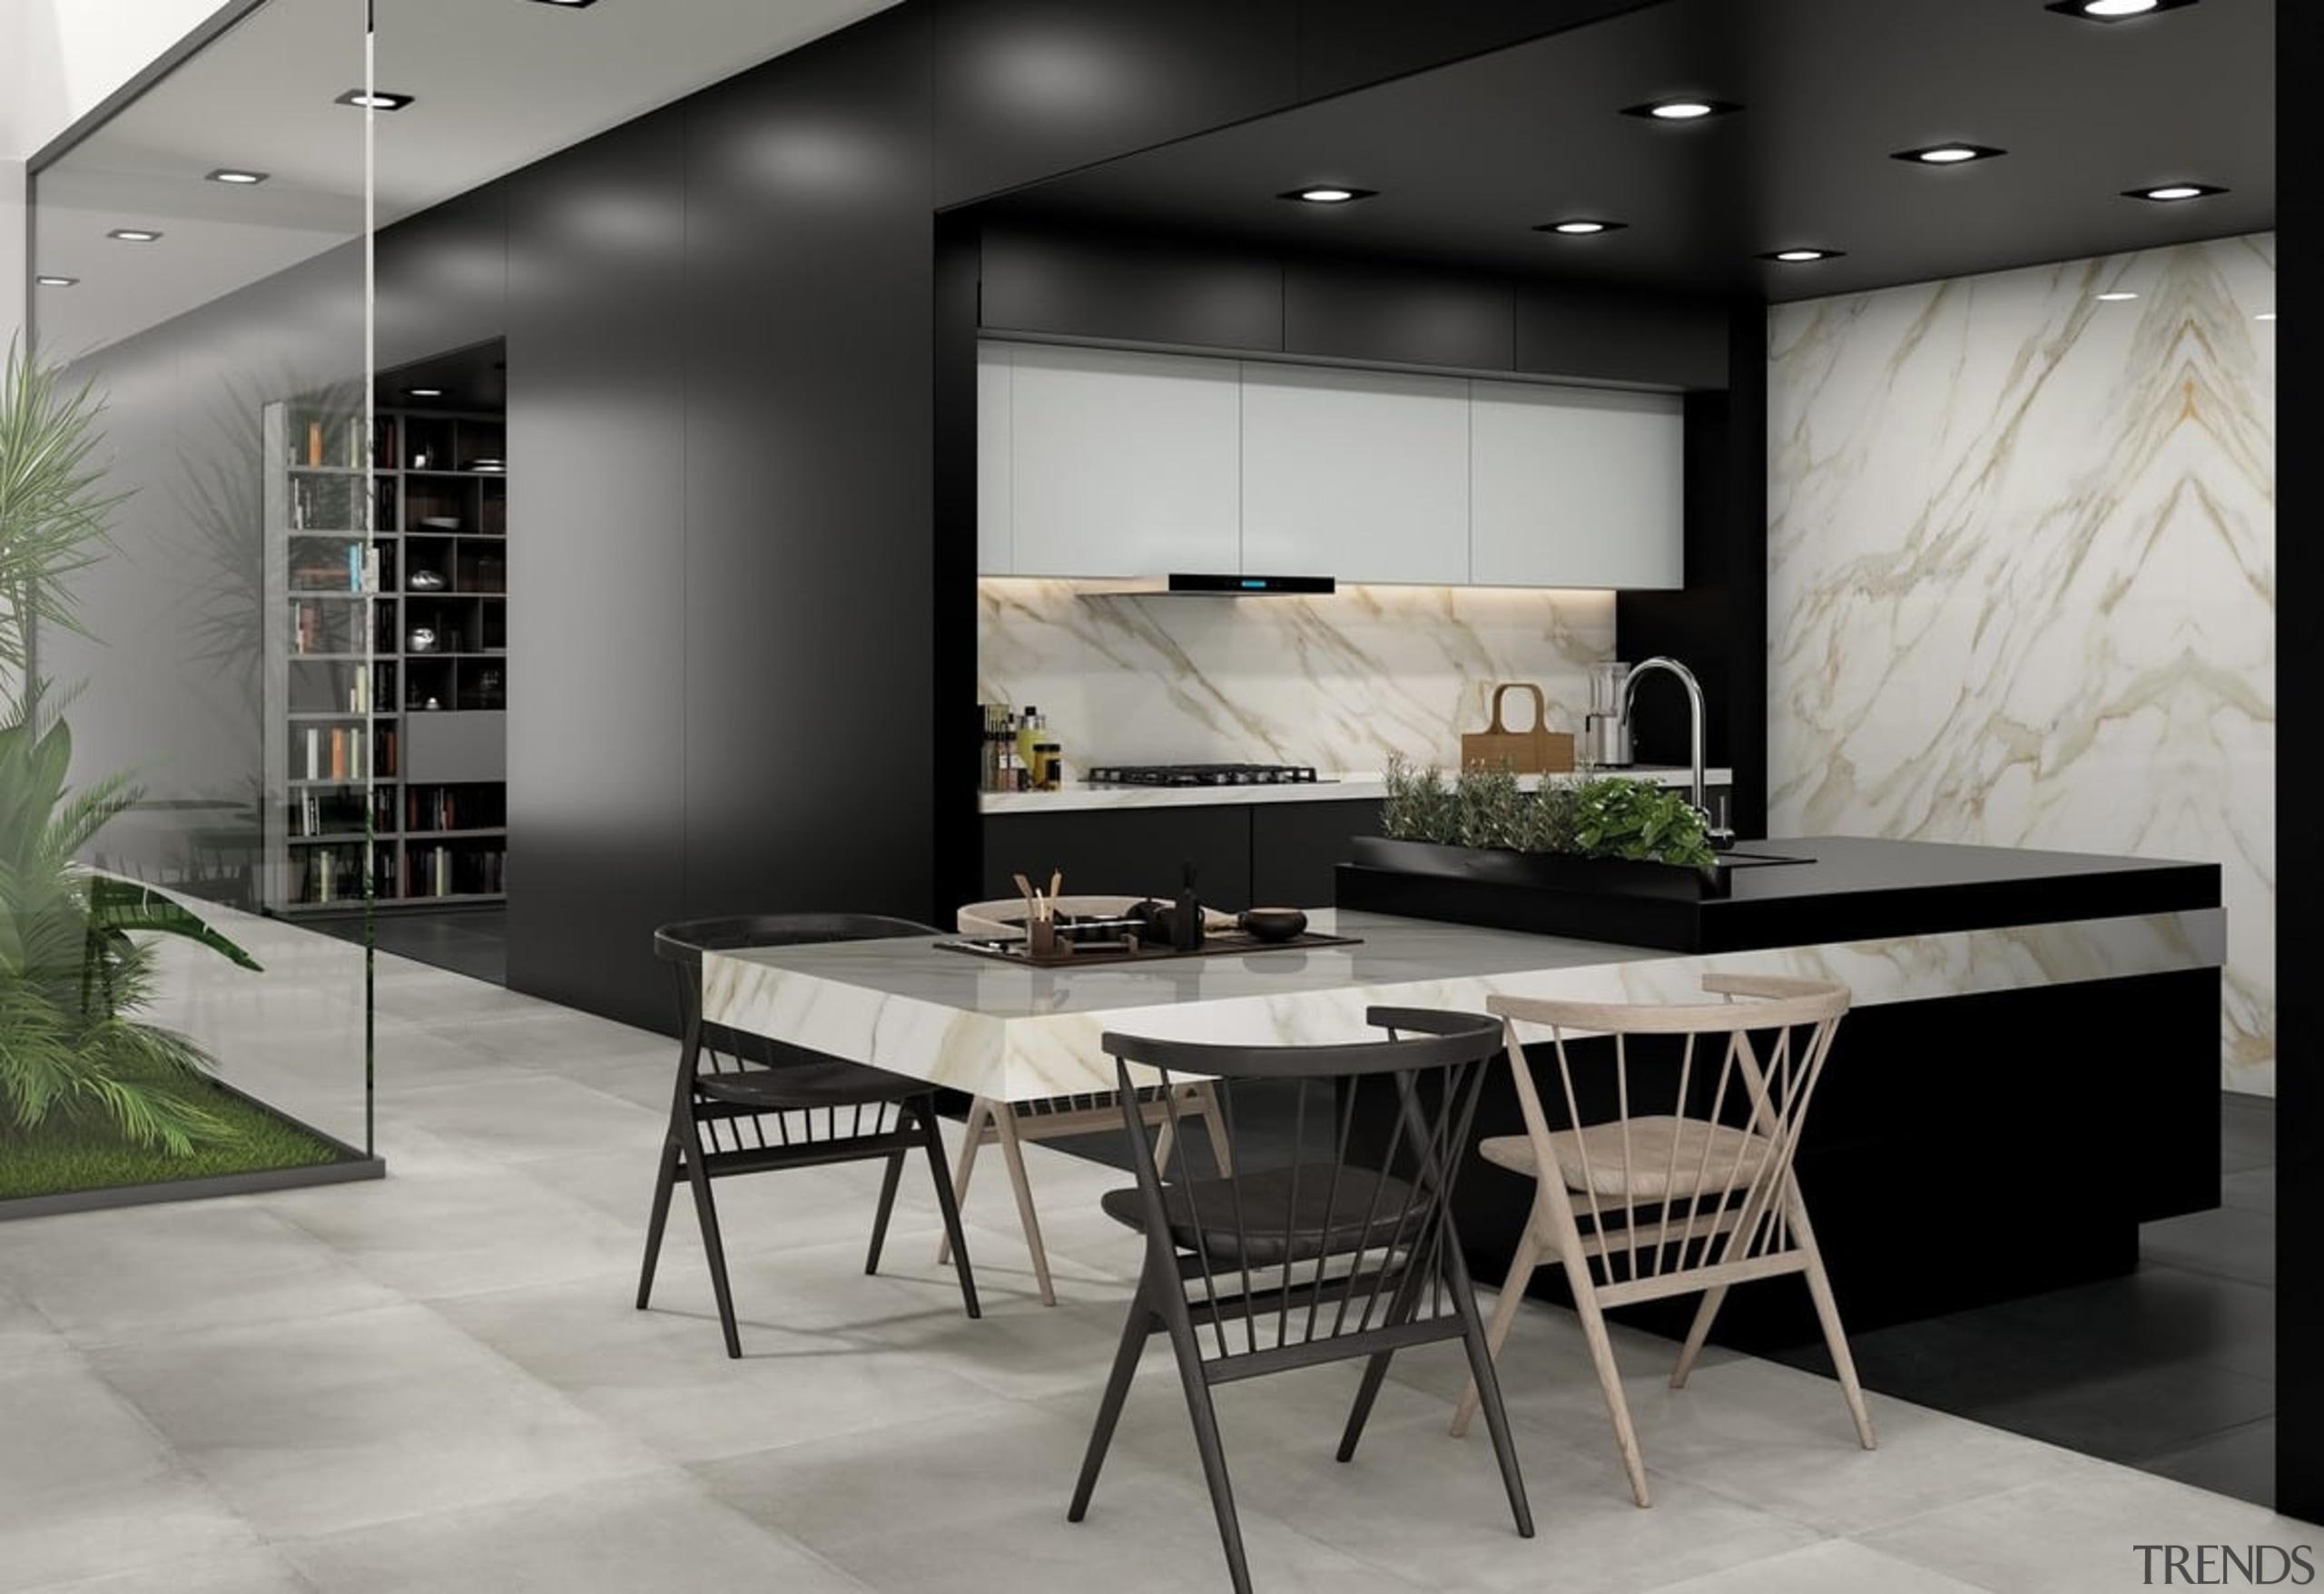 Universal Granite And Marbles Showroom - dining room dining room, floor, flooring, furniture, interior design, table, gray, black